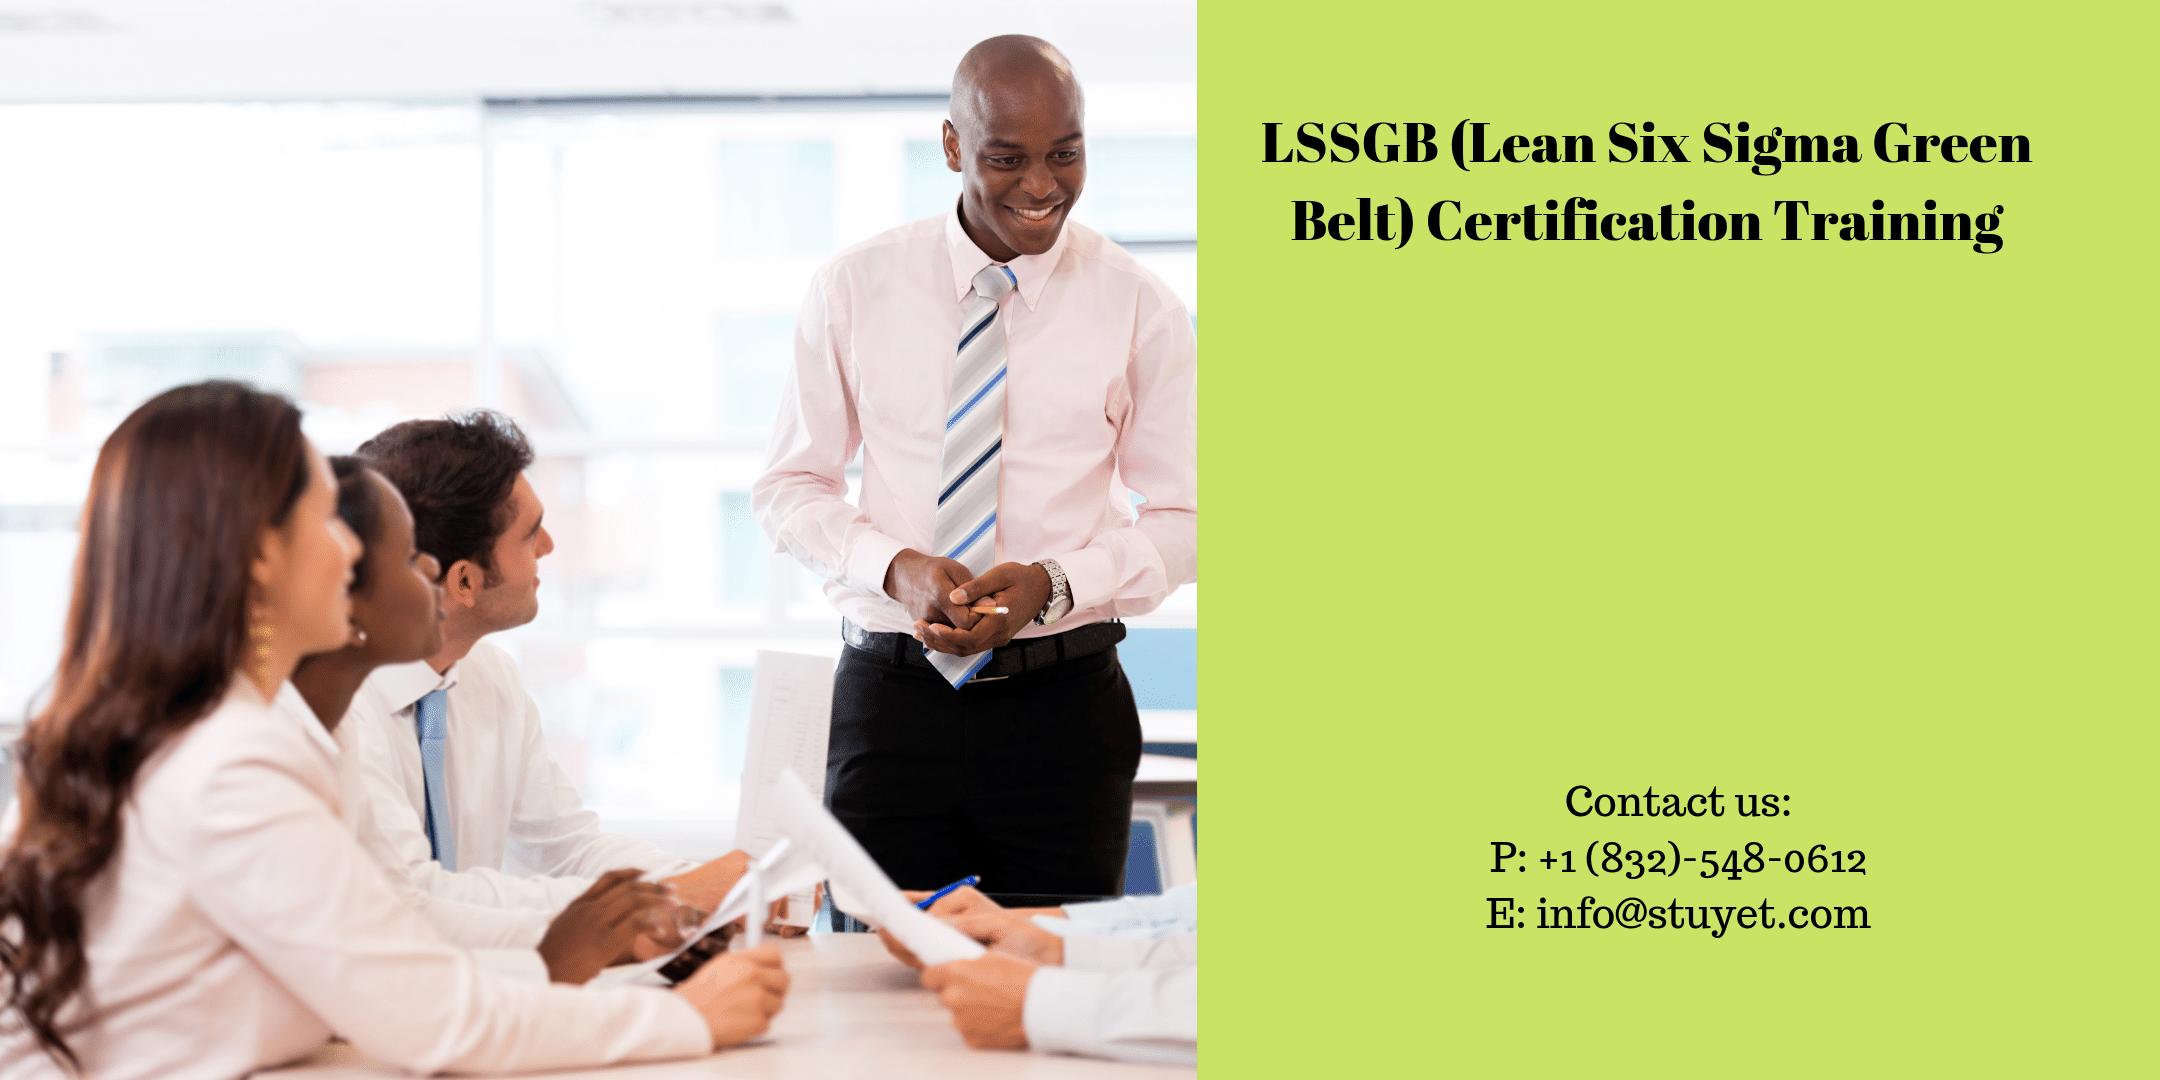 Lean Six Sigma Green Belt (LSSGB) Certification Training in Memphis,TN